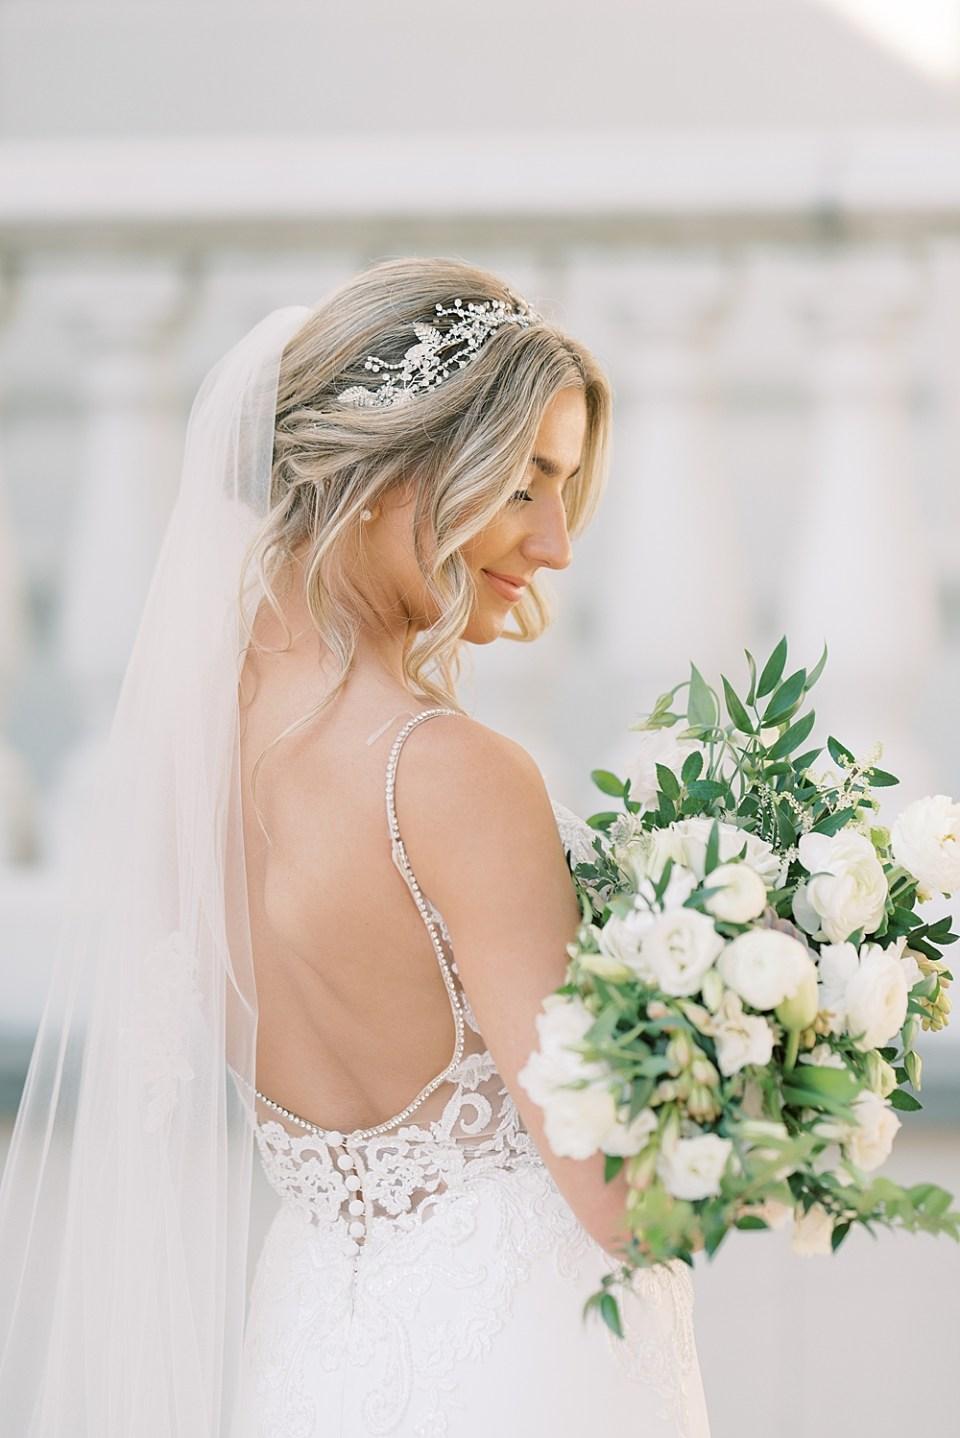 soft and romantic wedding portraits | ashford estate wedding photography | sarah canning photography